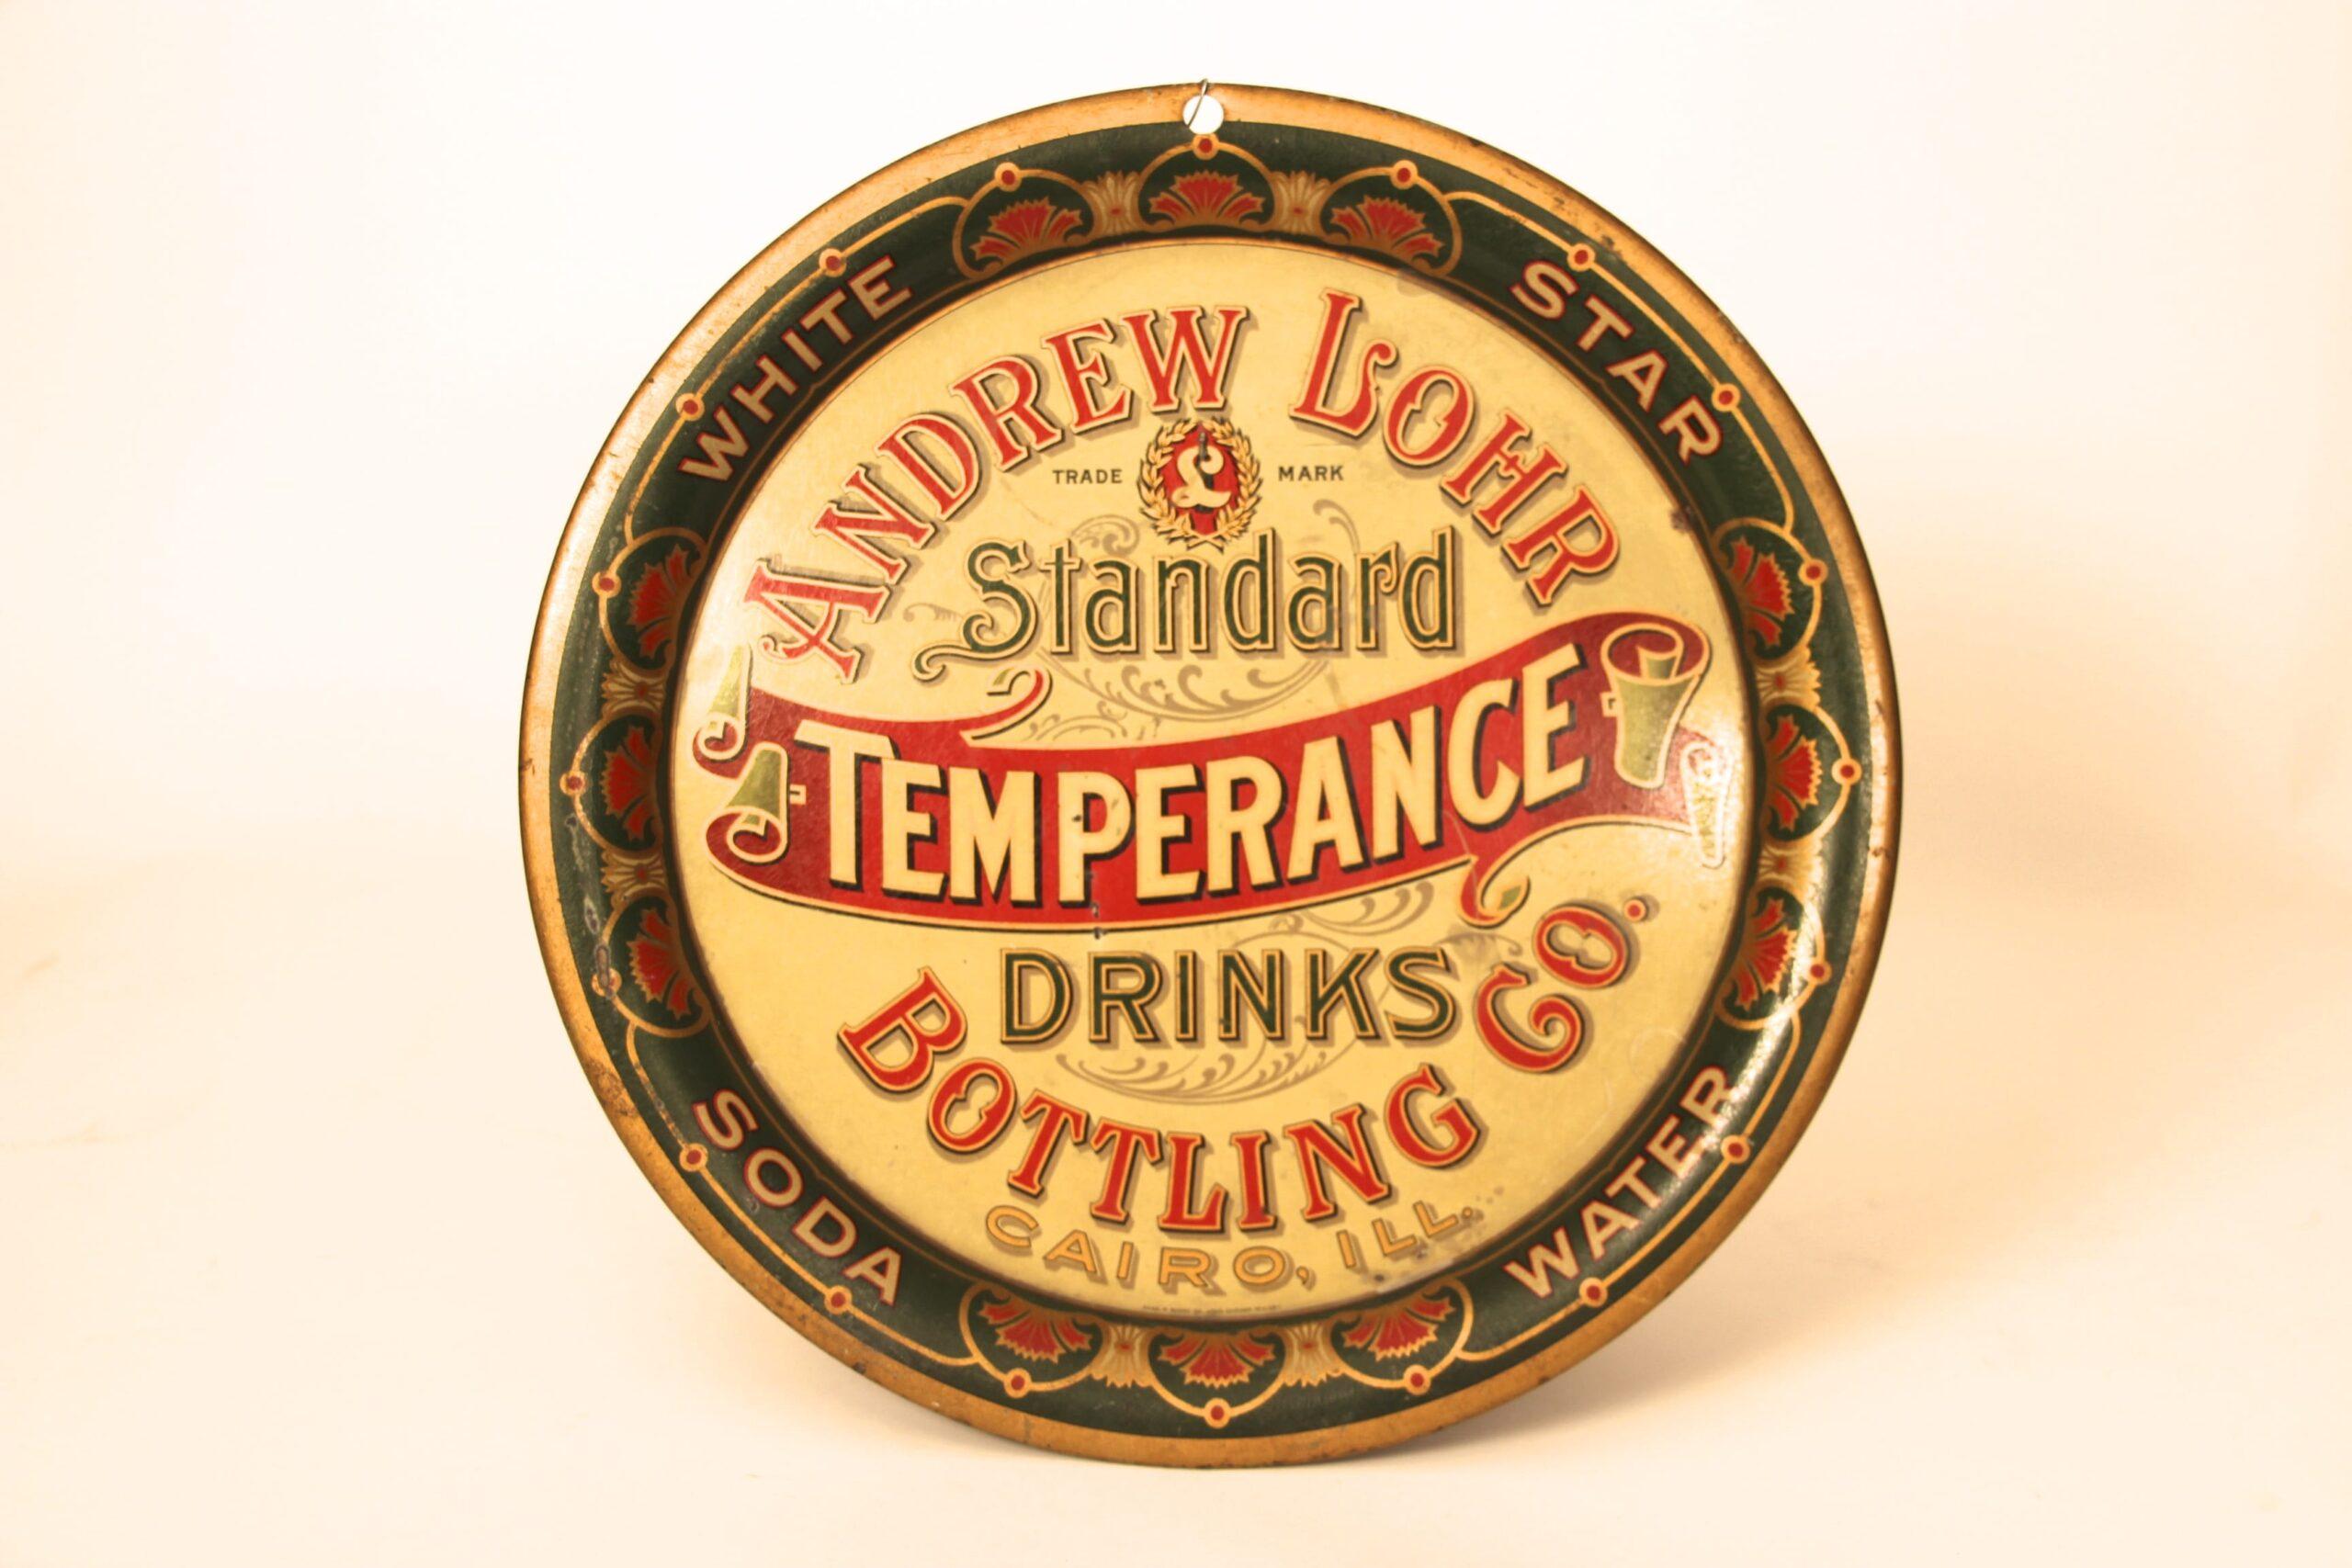 Andrew Lohr Bottling Works, Tin Serving Tray, Temperance Drinks, Cairo, IL